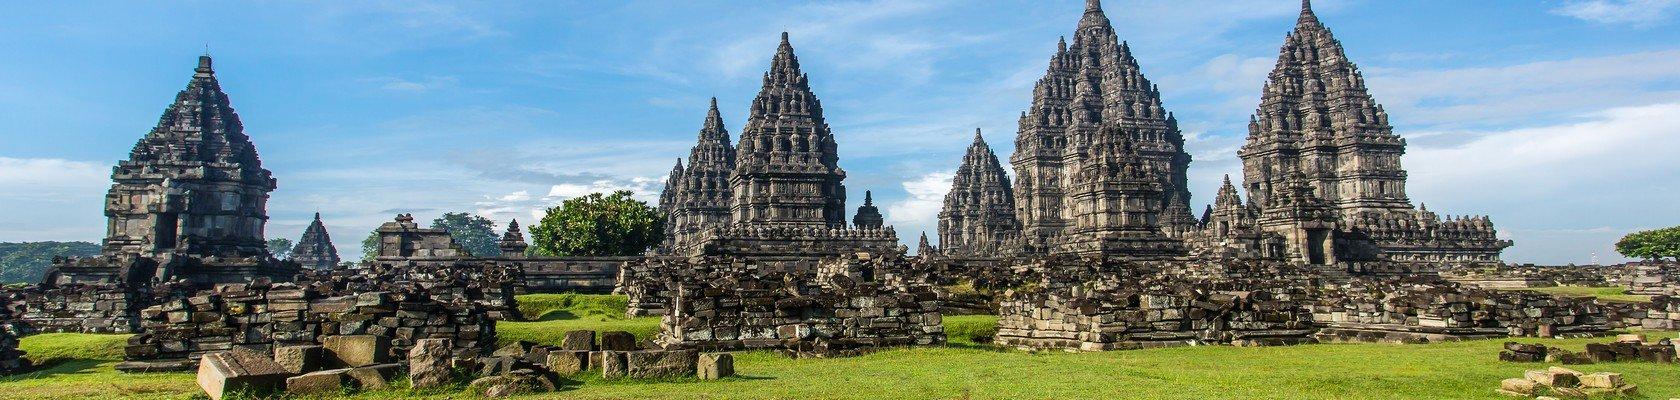 Prachtige Prambanan Tempels